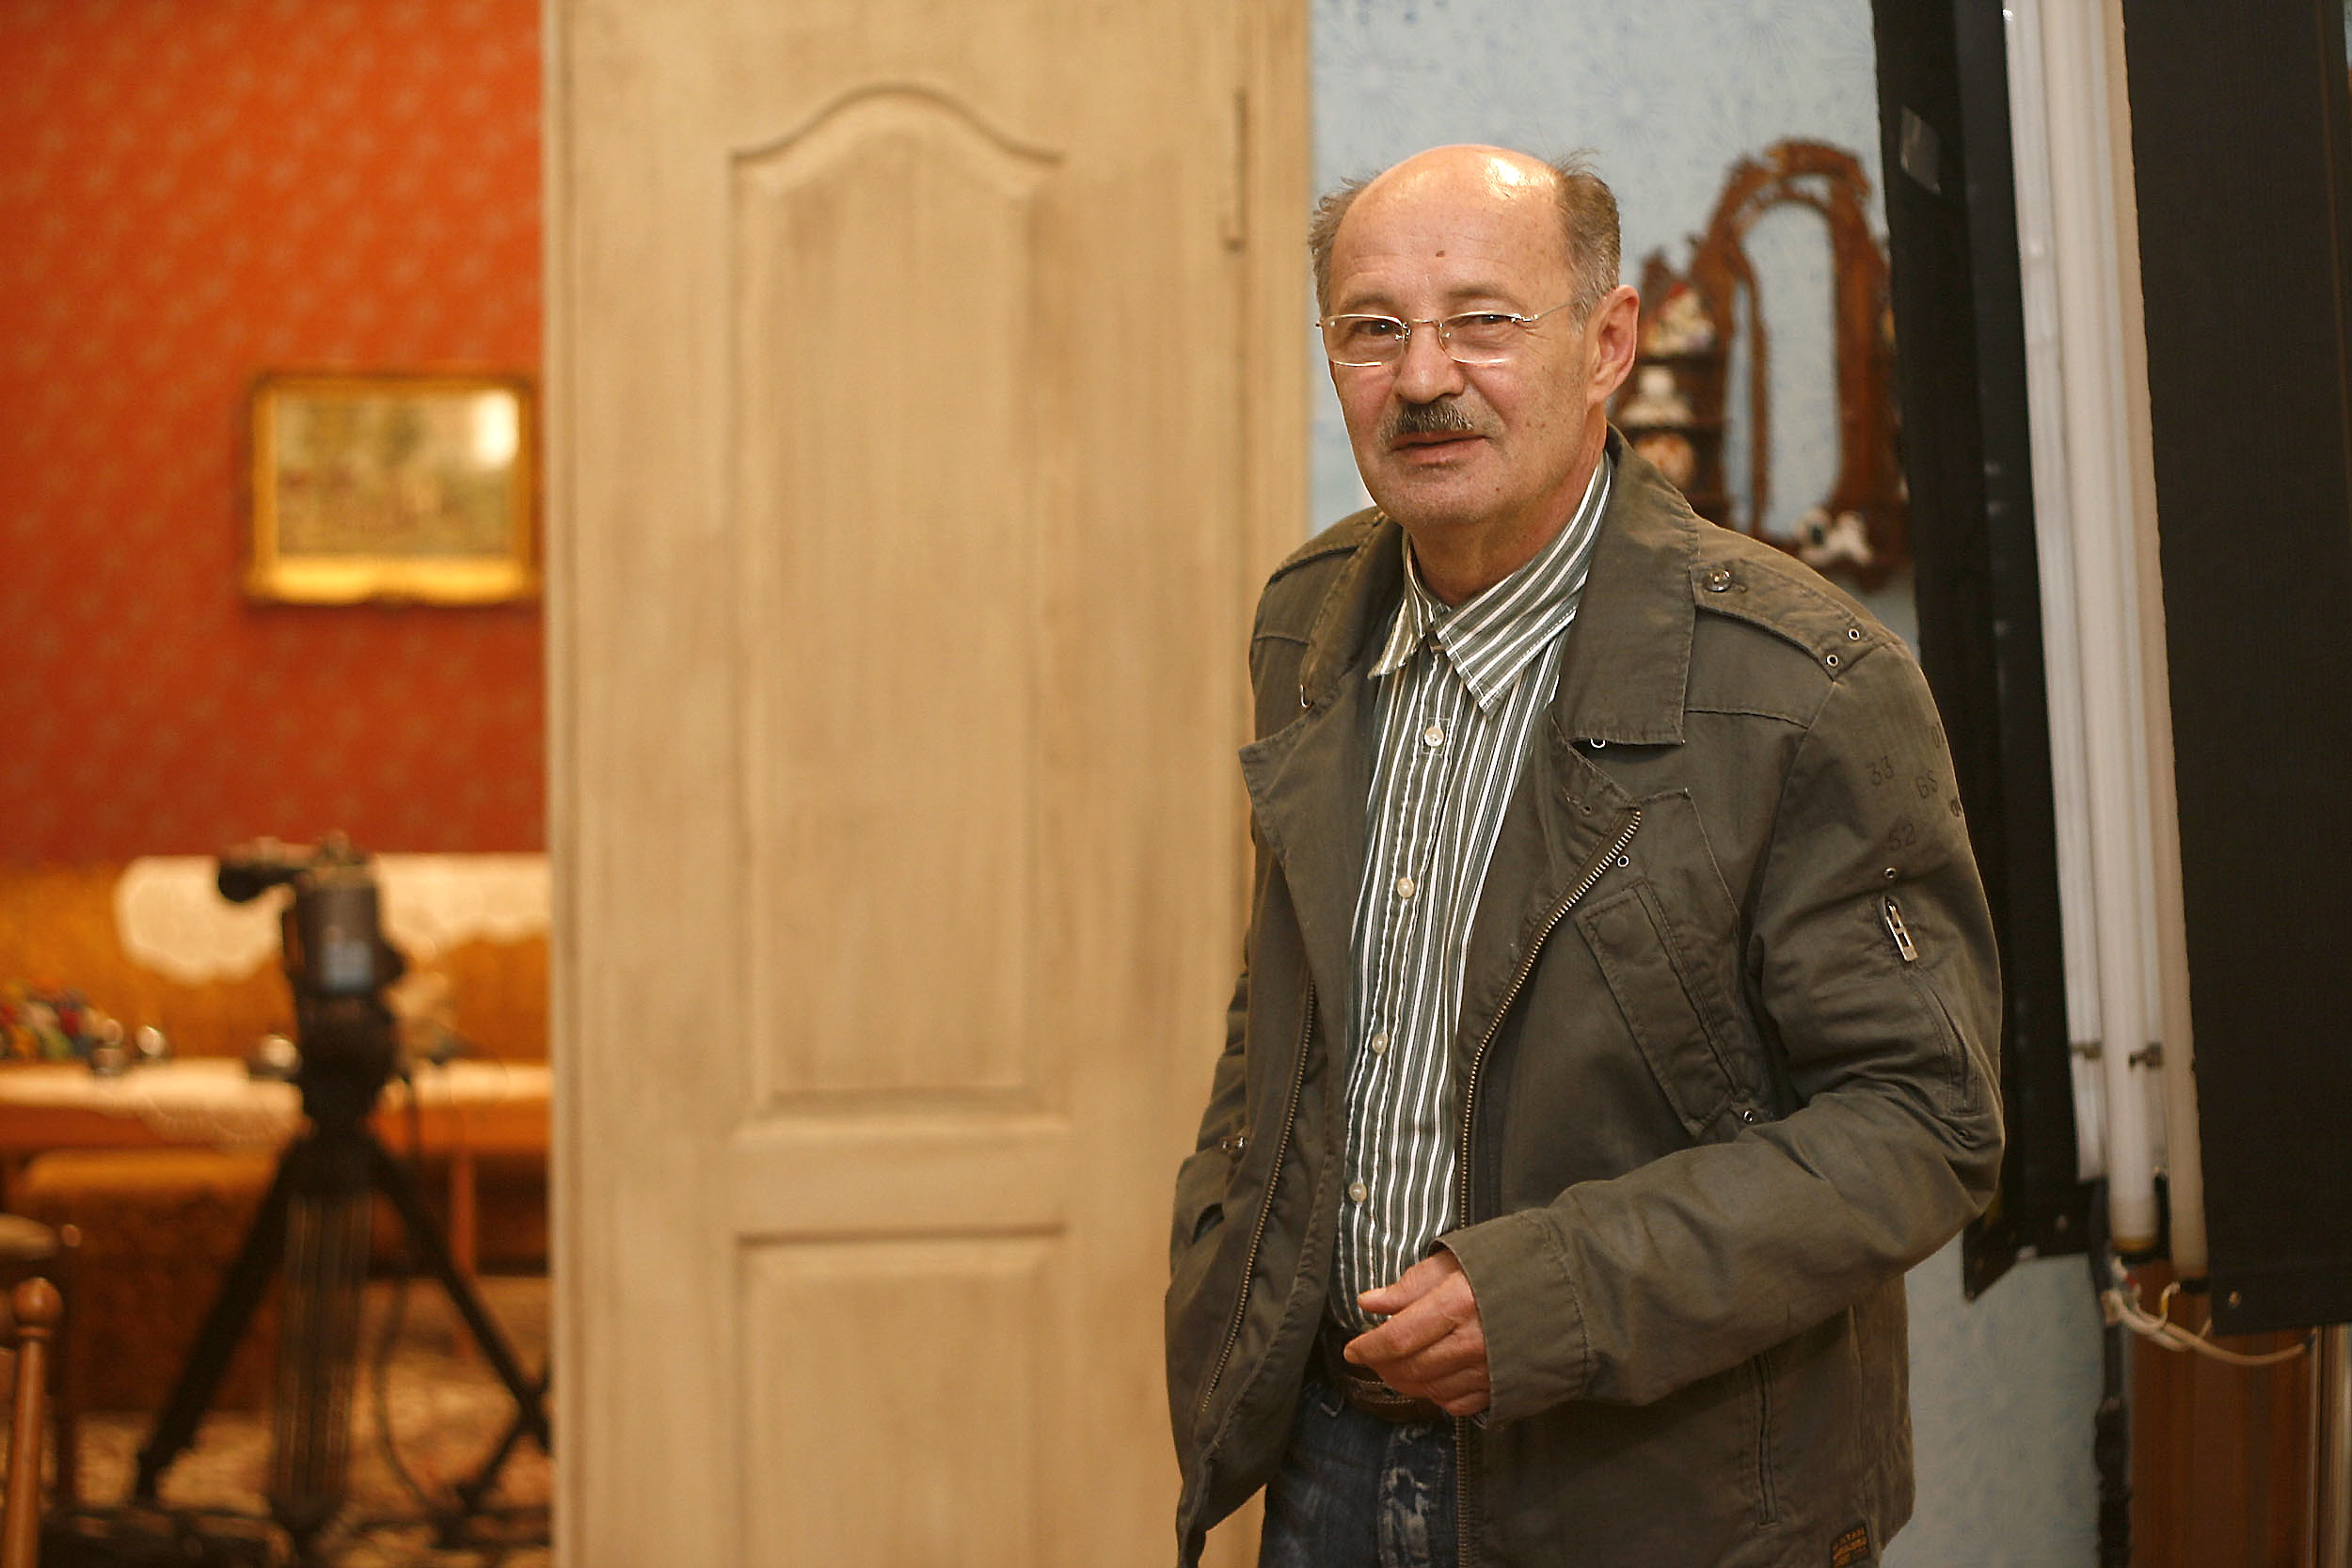 Sarajevo, 171108. Mustafa Nadarevic, na pauzi snimanja serije ''Lud zbunjen normalan''. Foto: V.M.Tauber